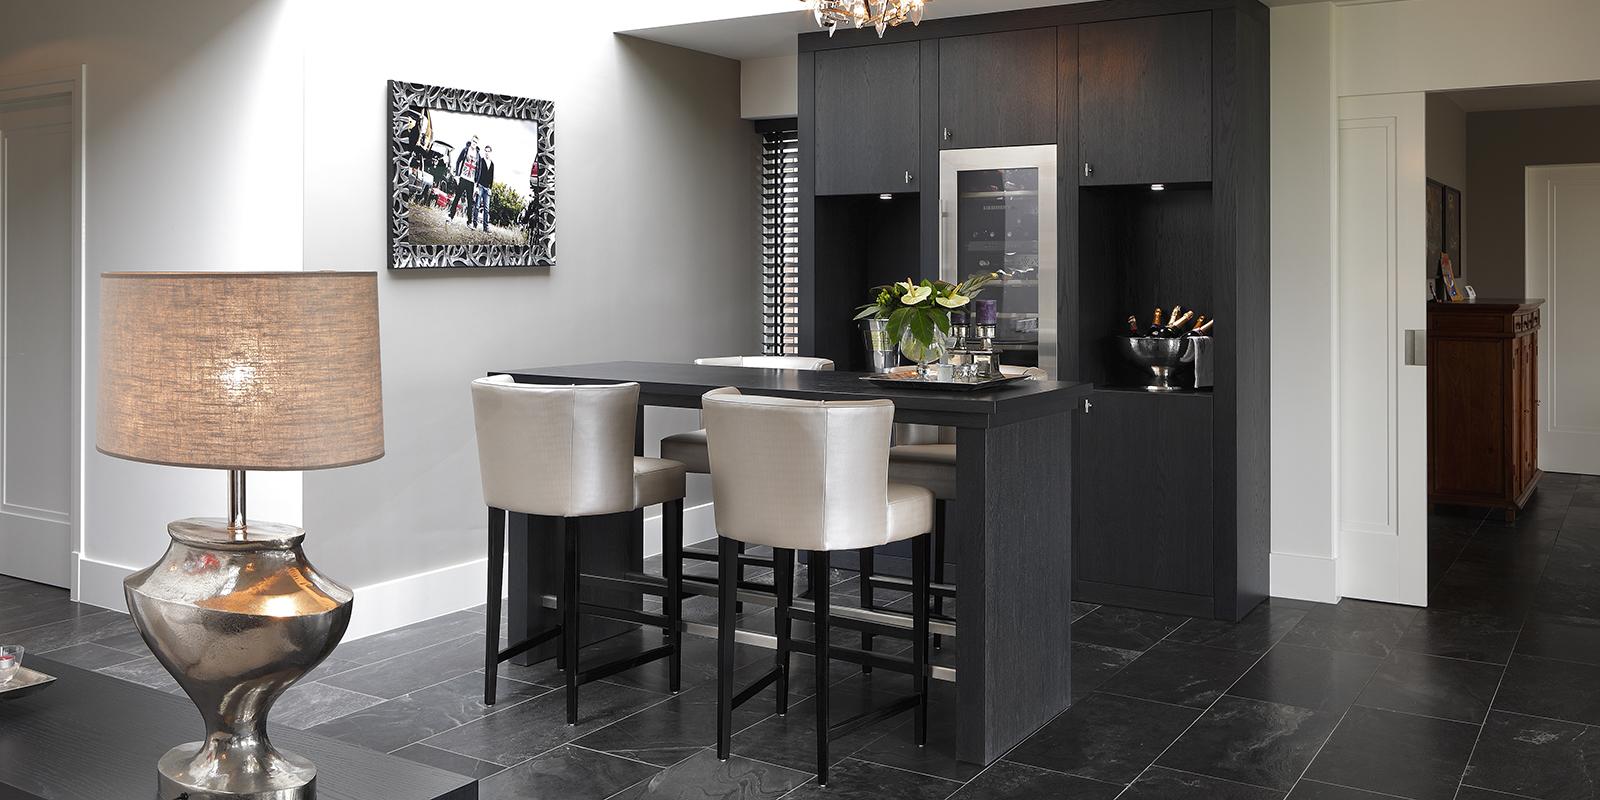 the art of living exclusief wonen interieurbouw vos interieur stijl modern interieur